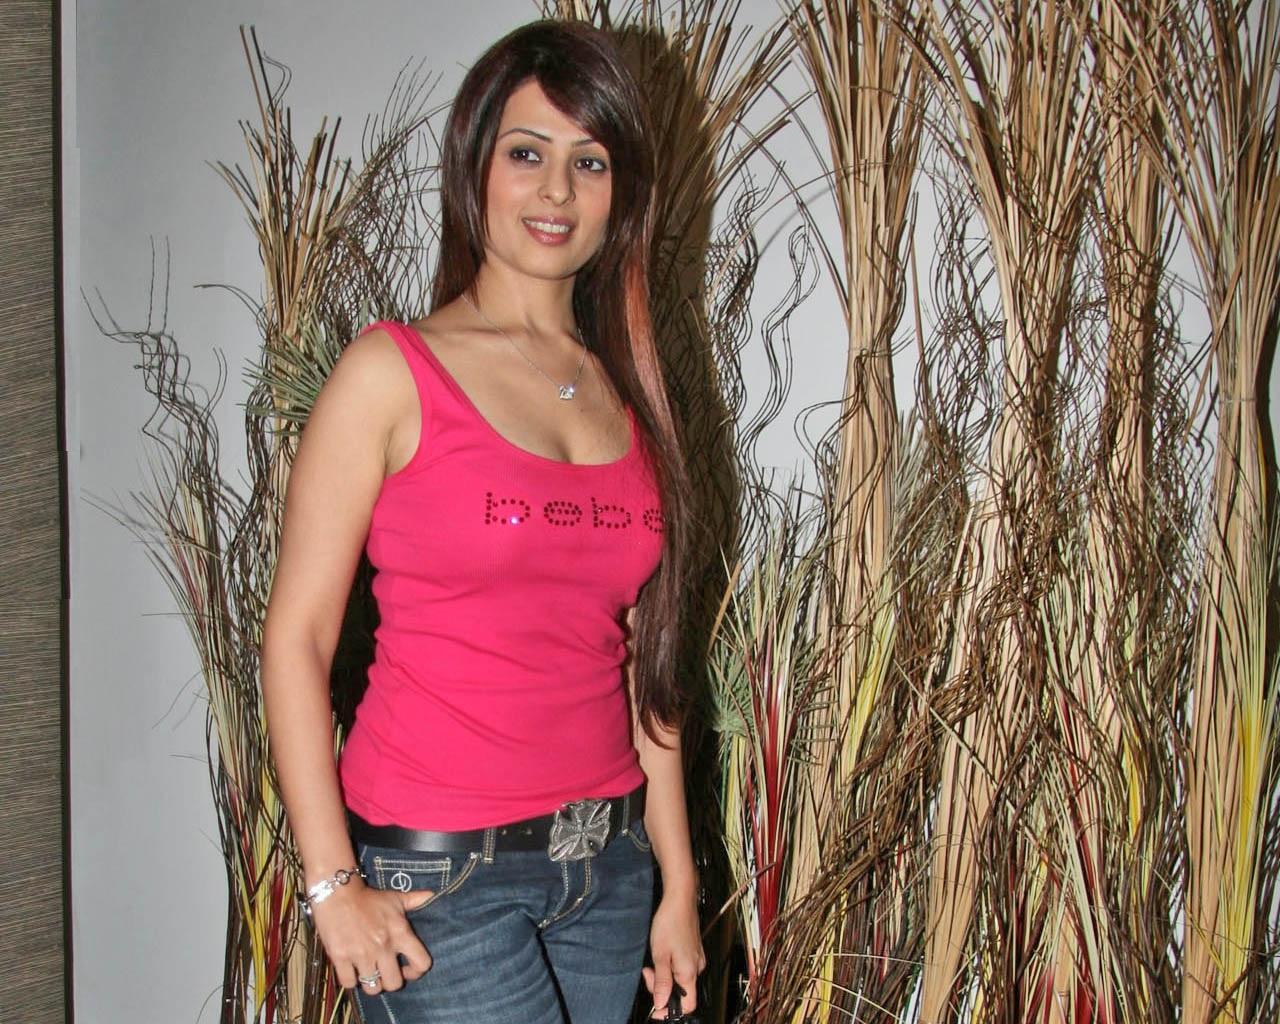 Anjana Sukhani topless images